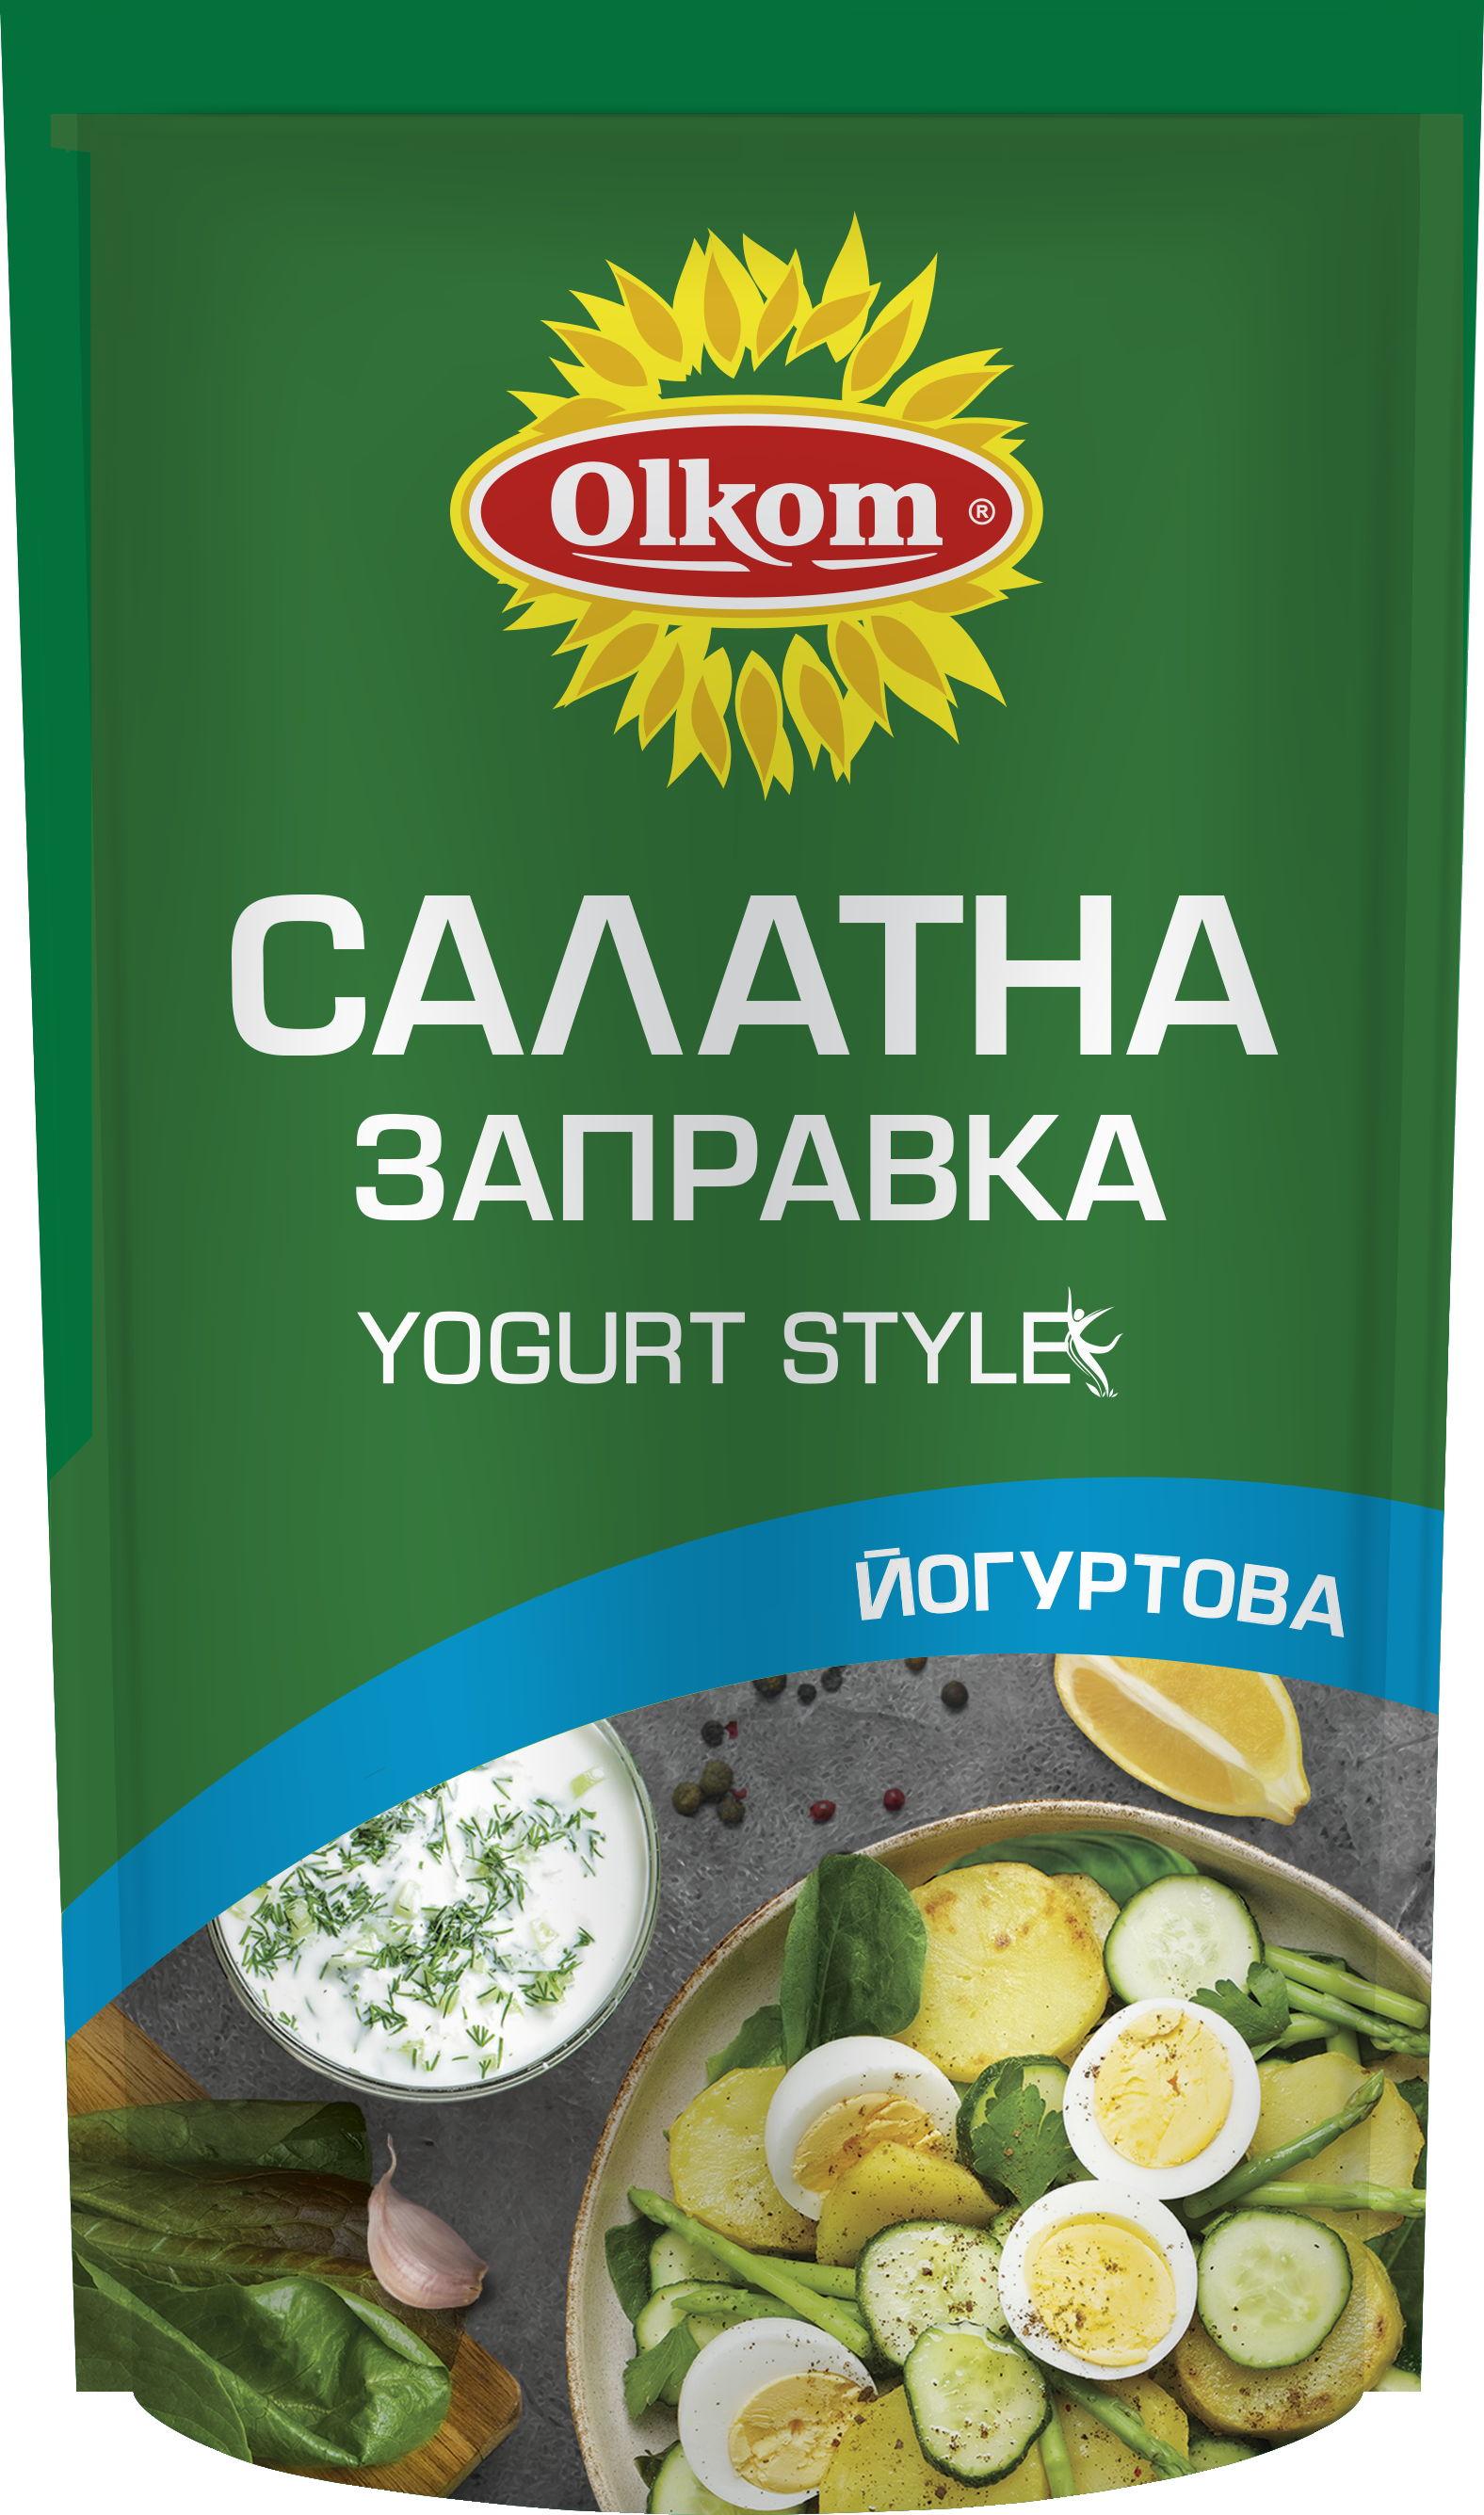 Yogurt Style salad dressing